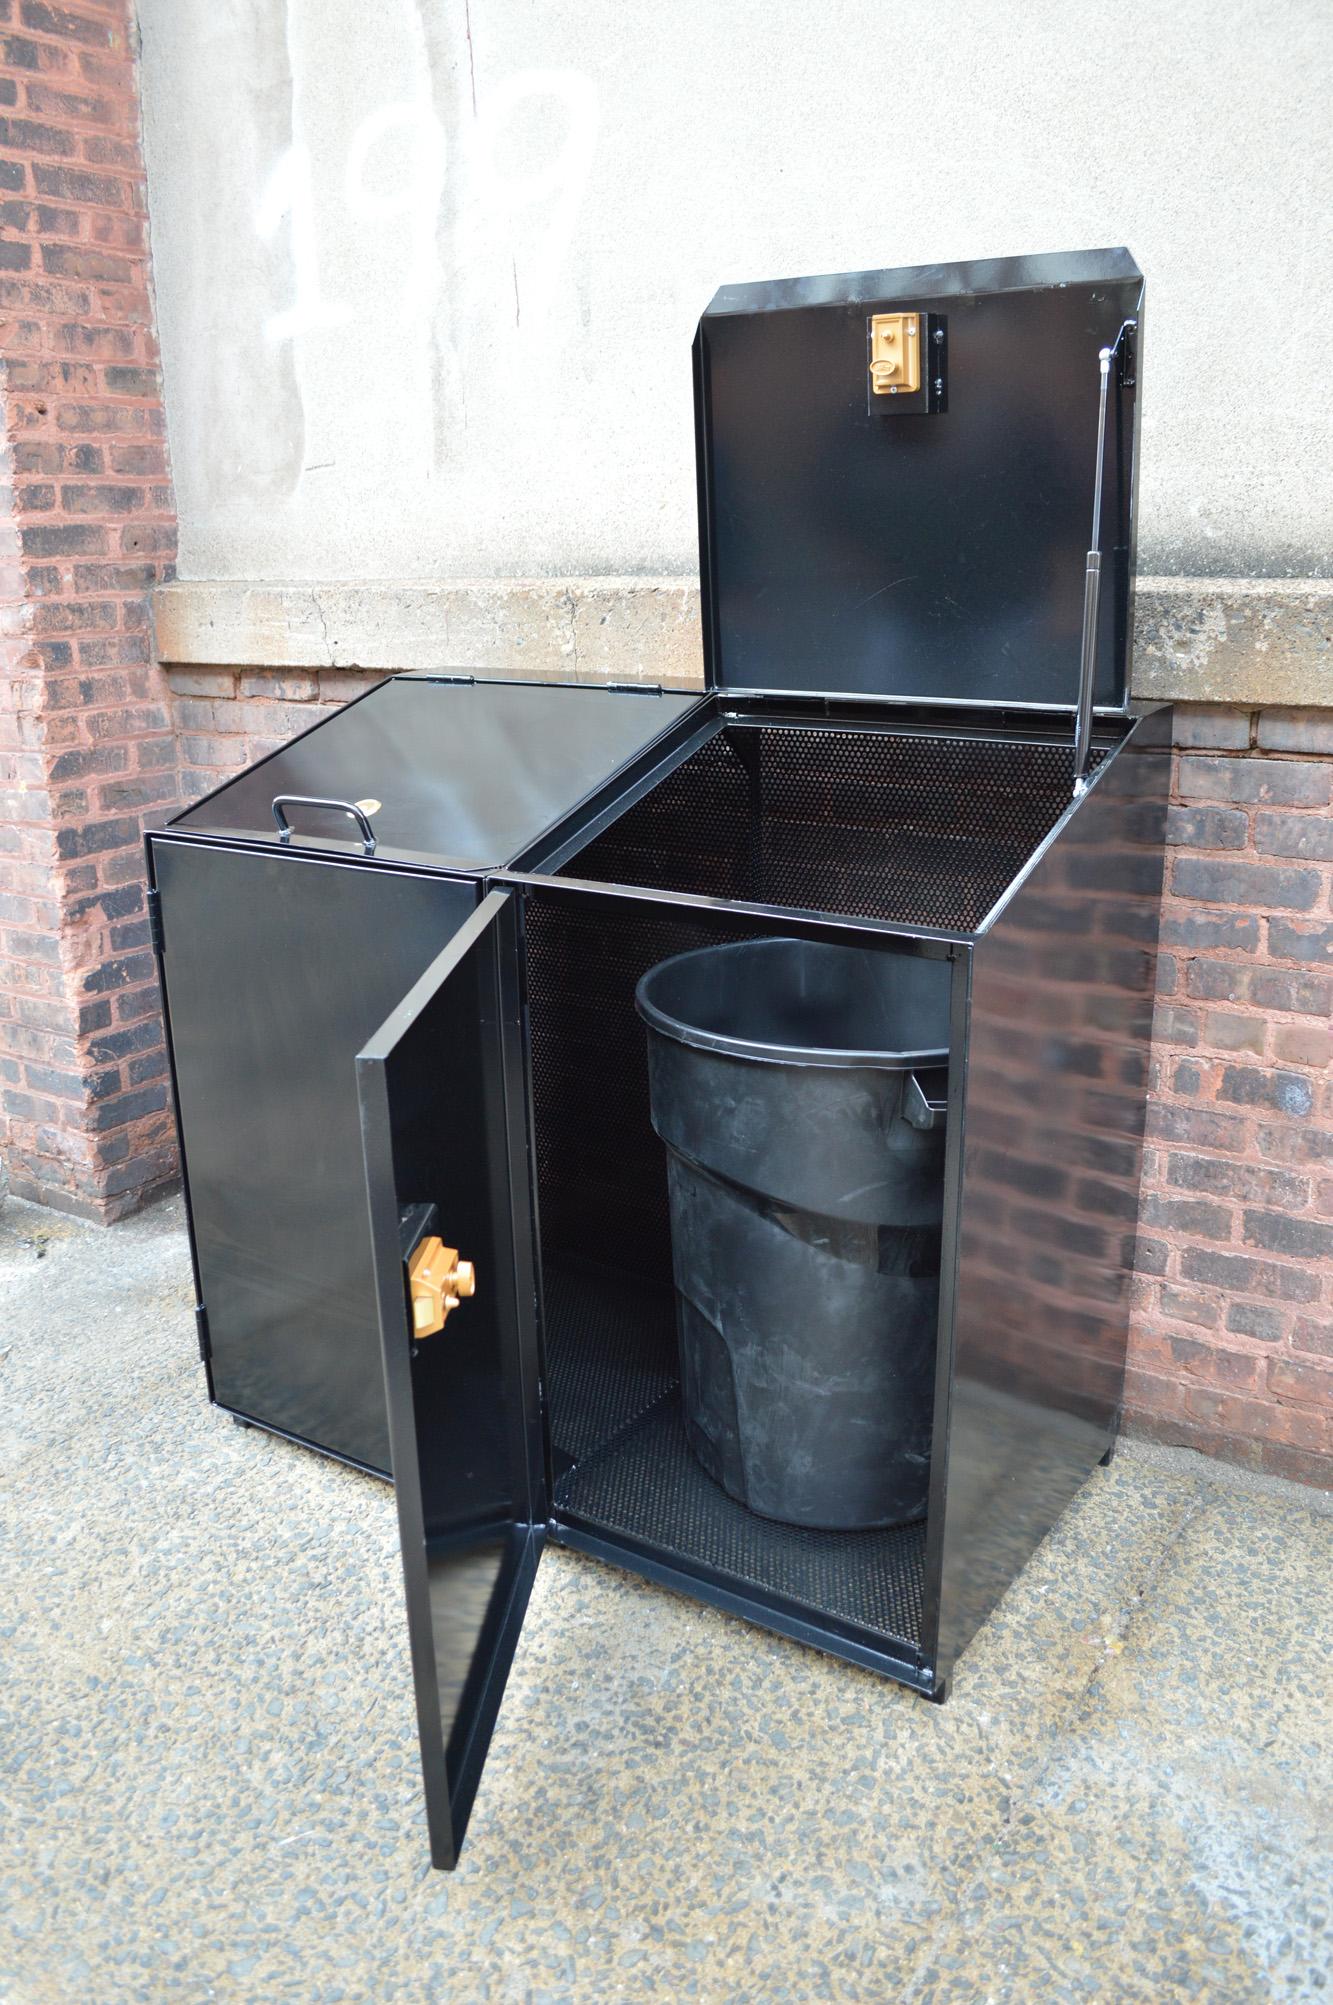 AStandard_trash_enclosure_4